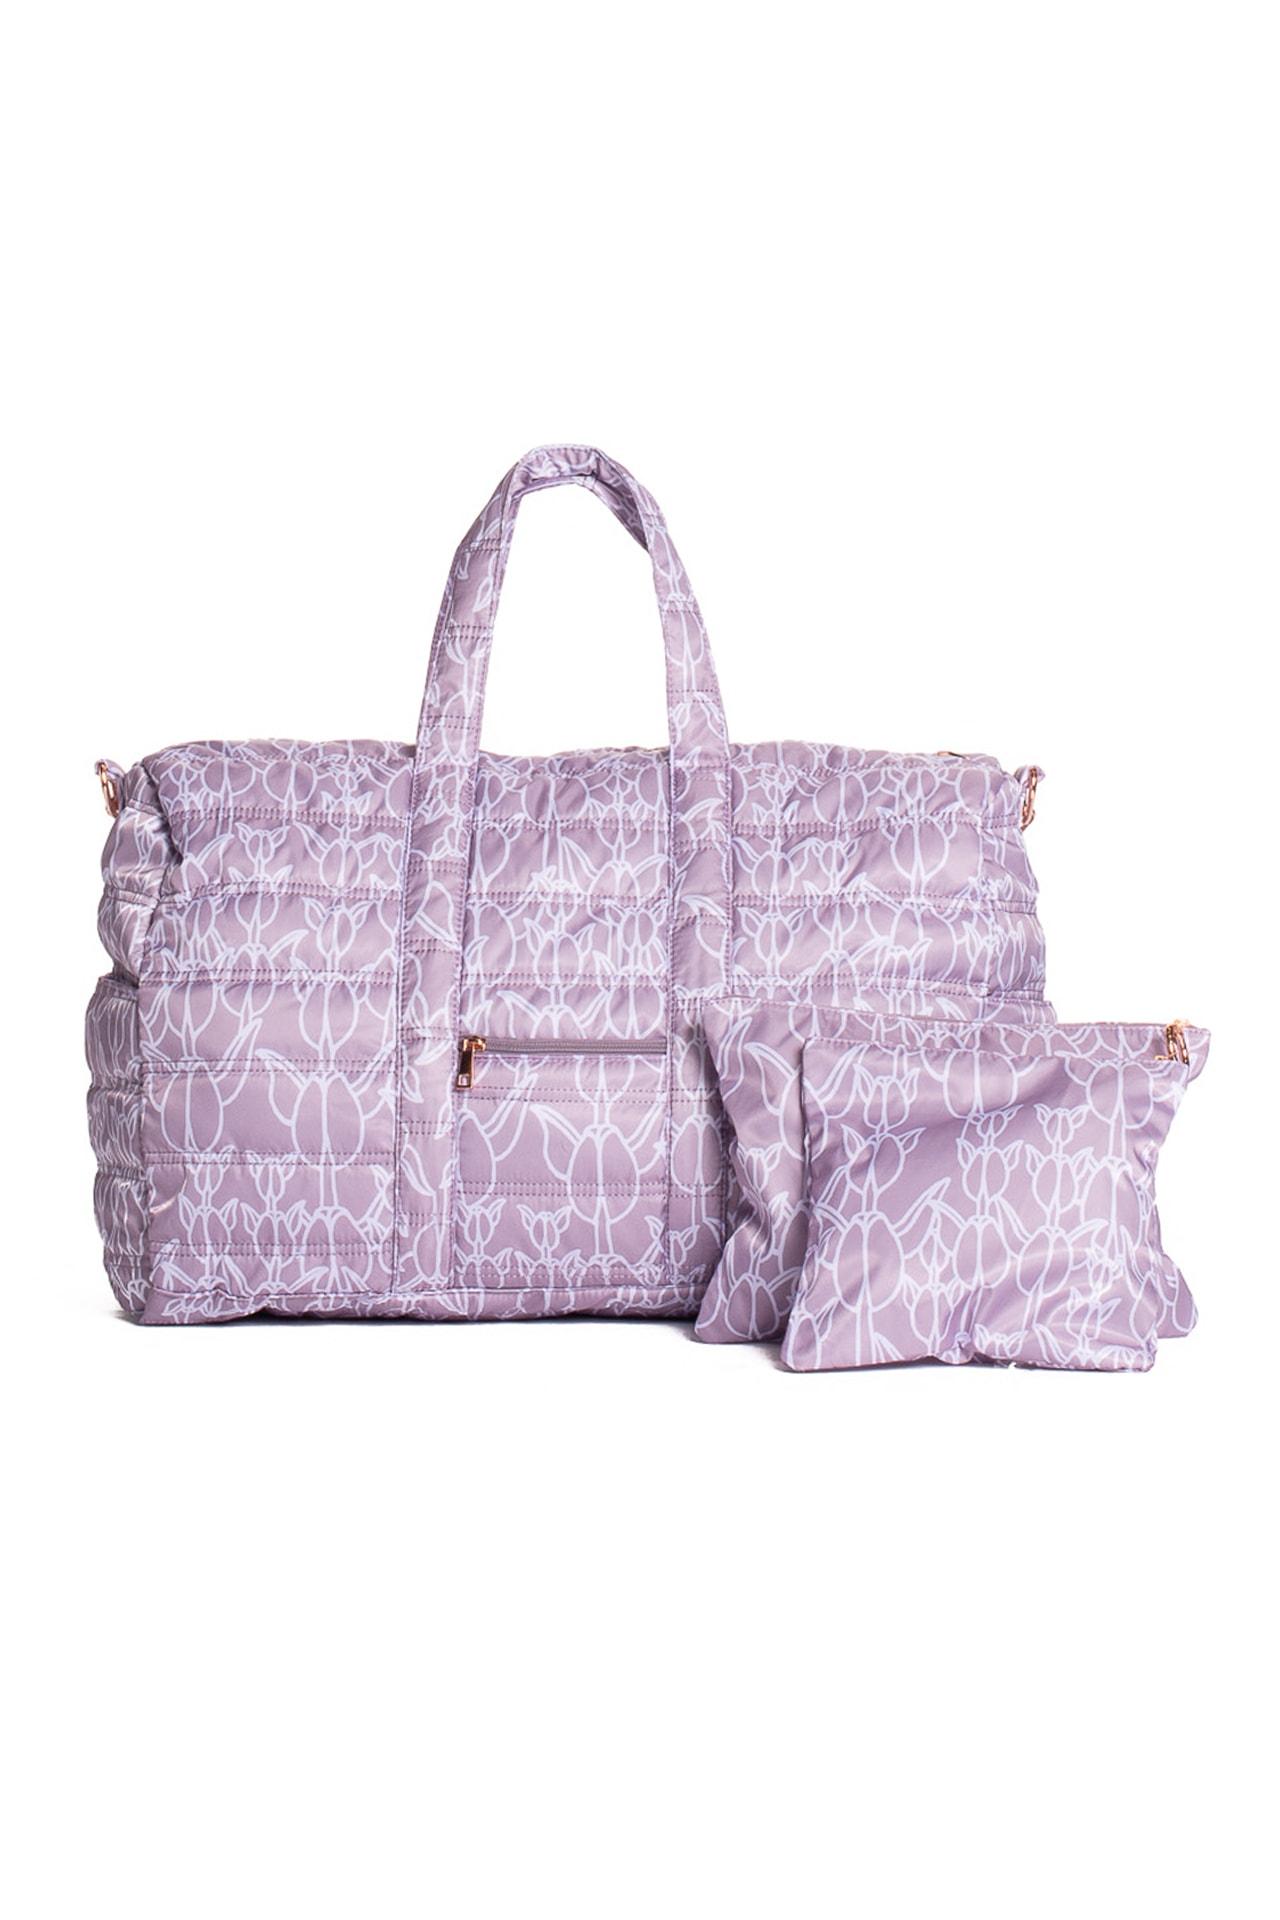 Laulea Bag in Kapualiko Purple